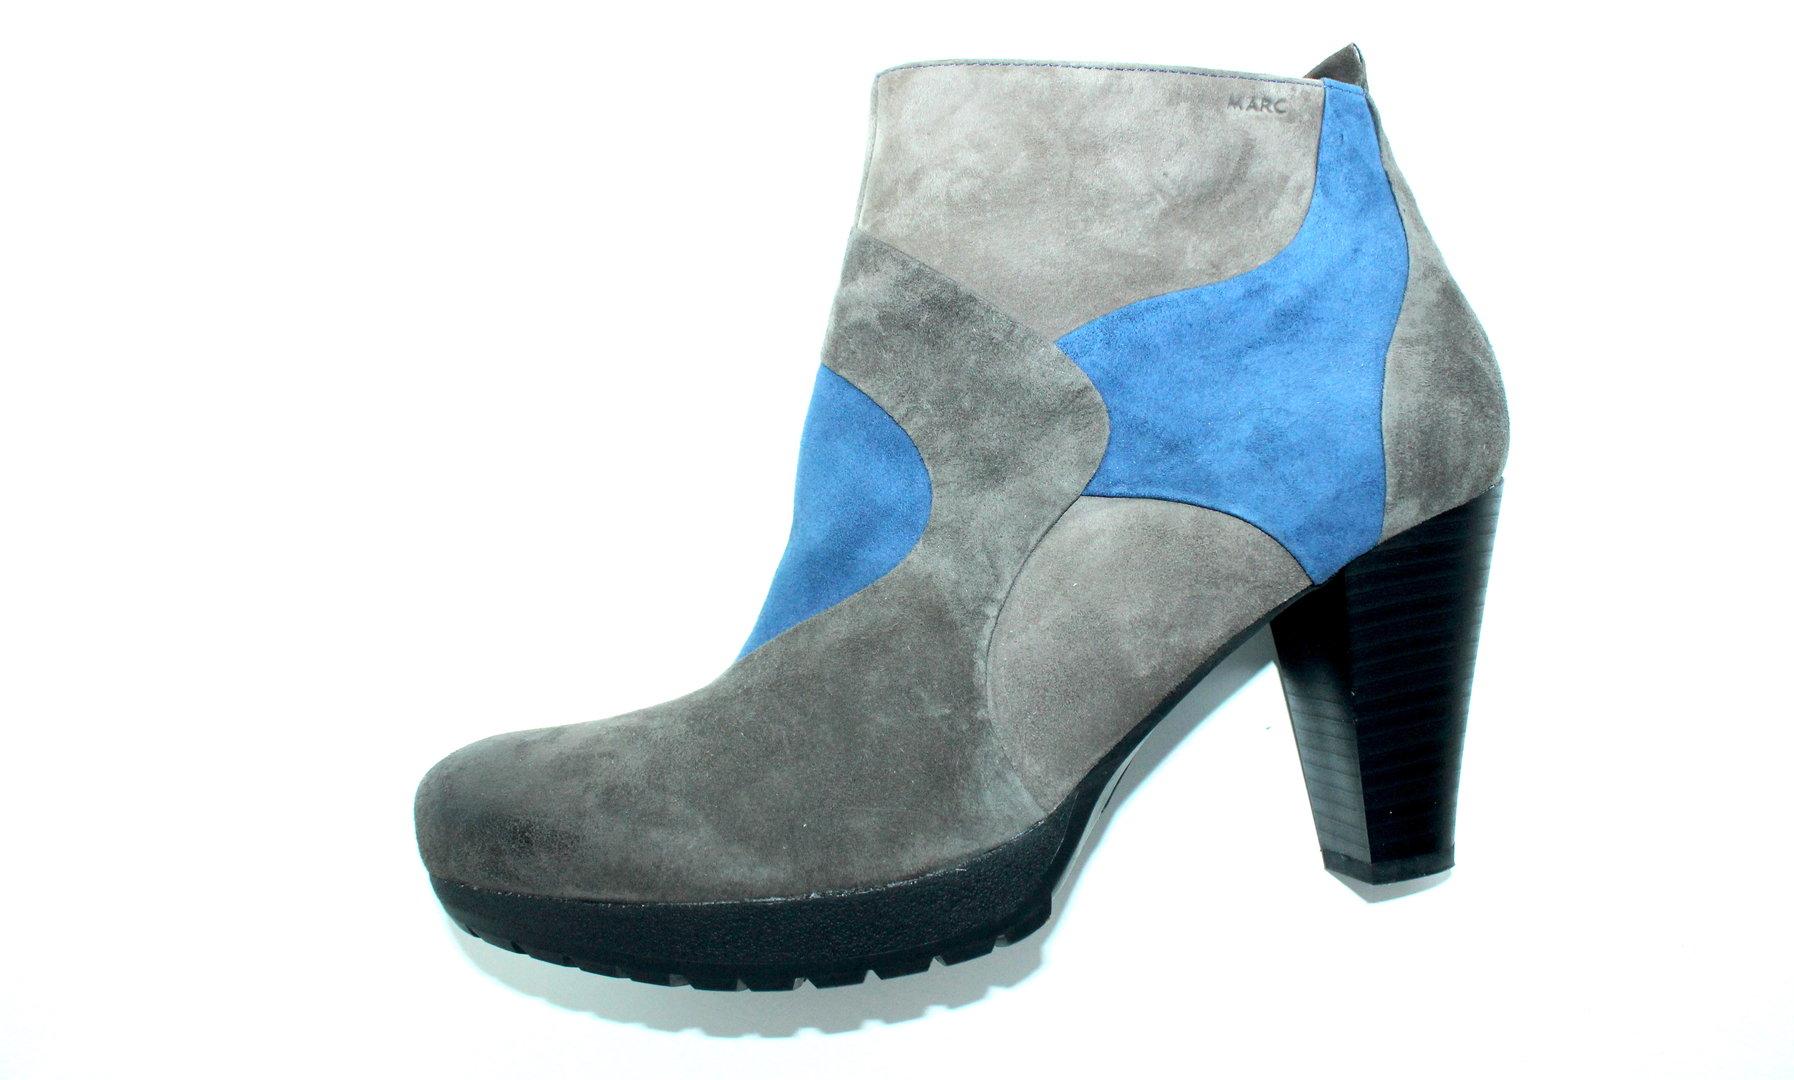 new arrival 26f66 494a7 MARC Stiefeletten Ankle Boots Damen Wildleder blau 41